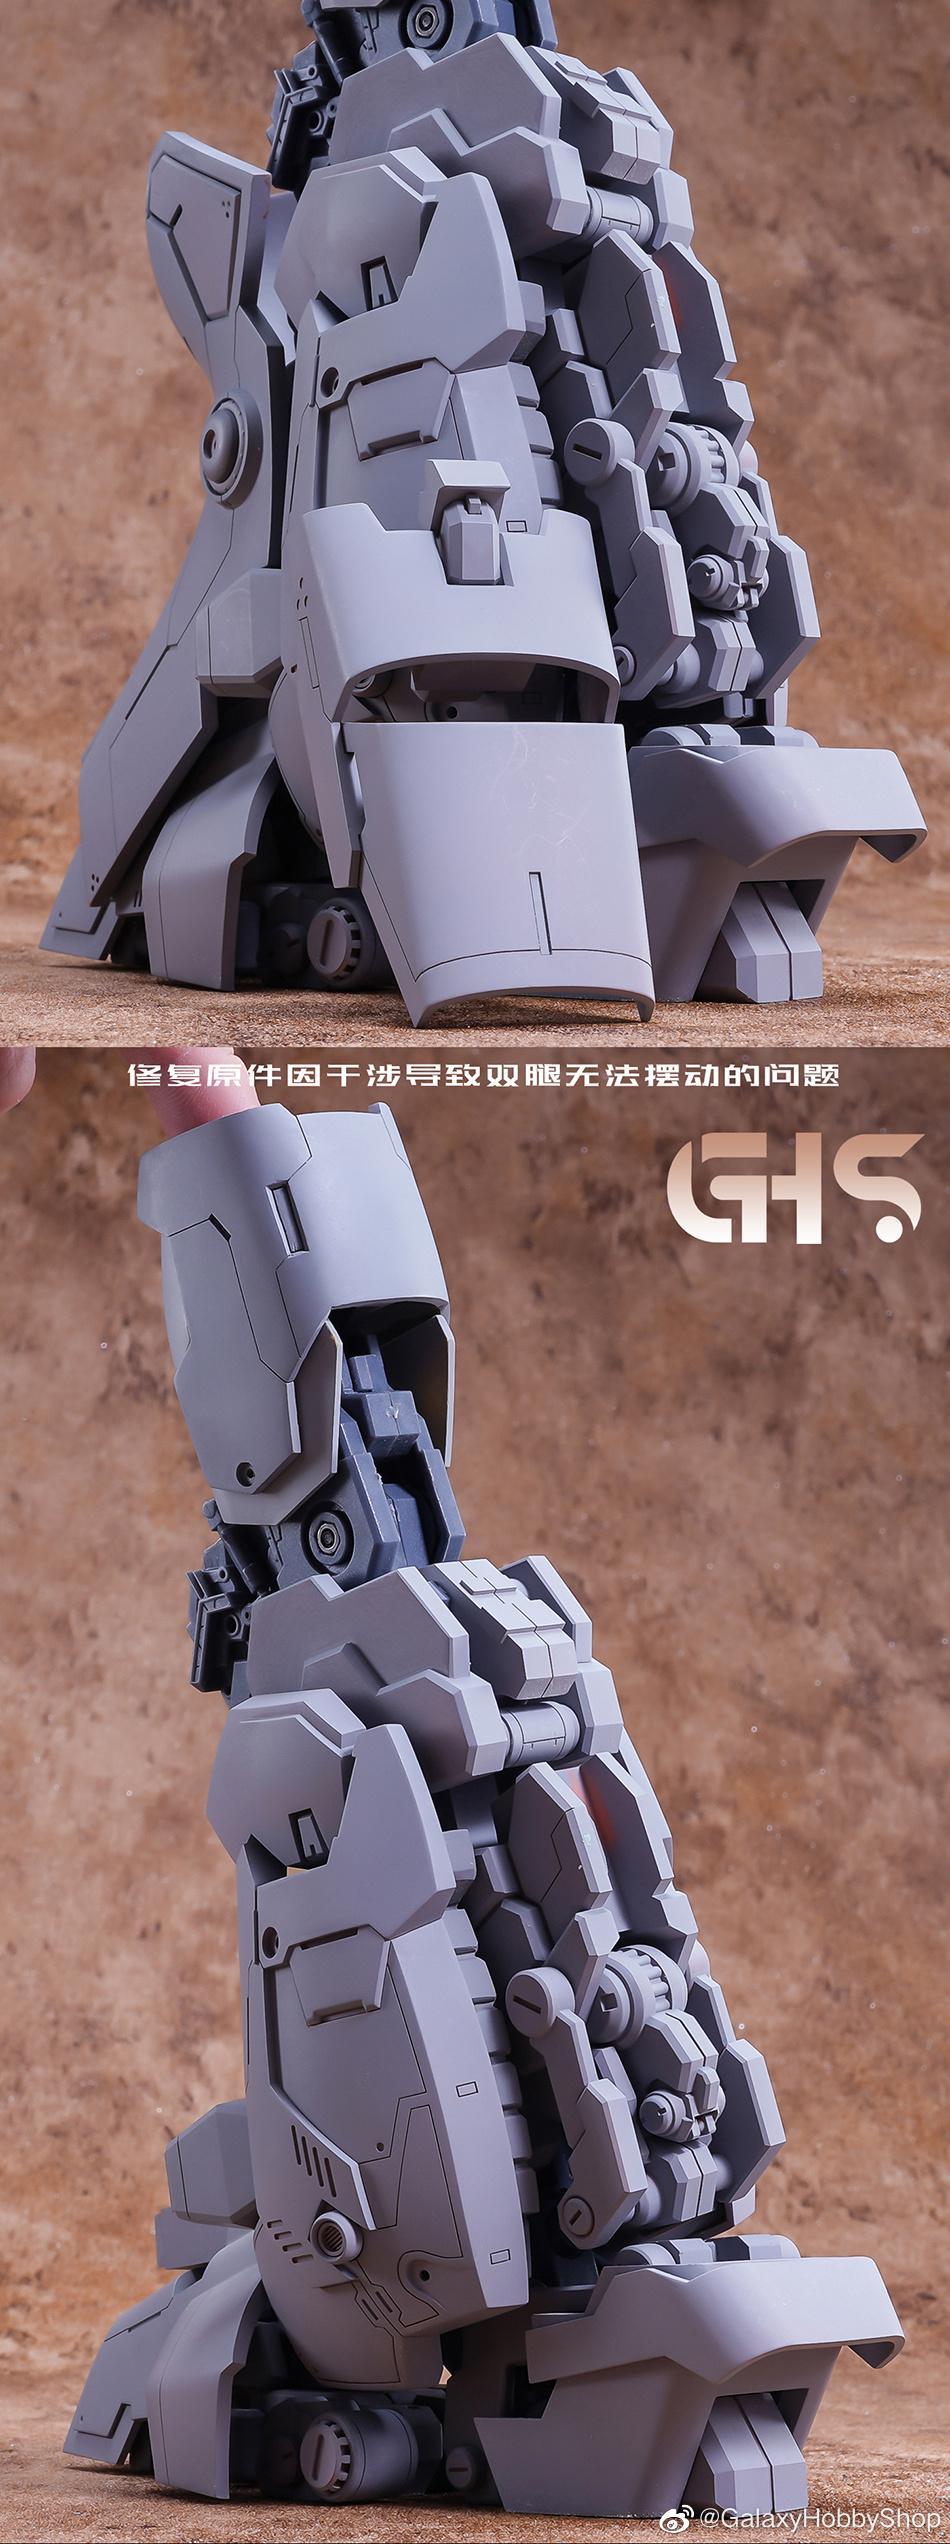 G871_GS_GSH_the_o_GK_010.jpg